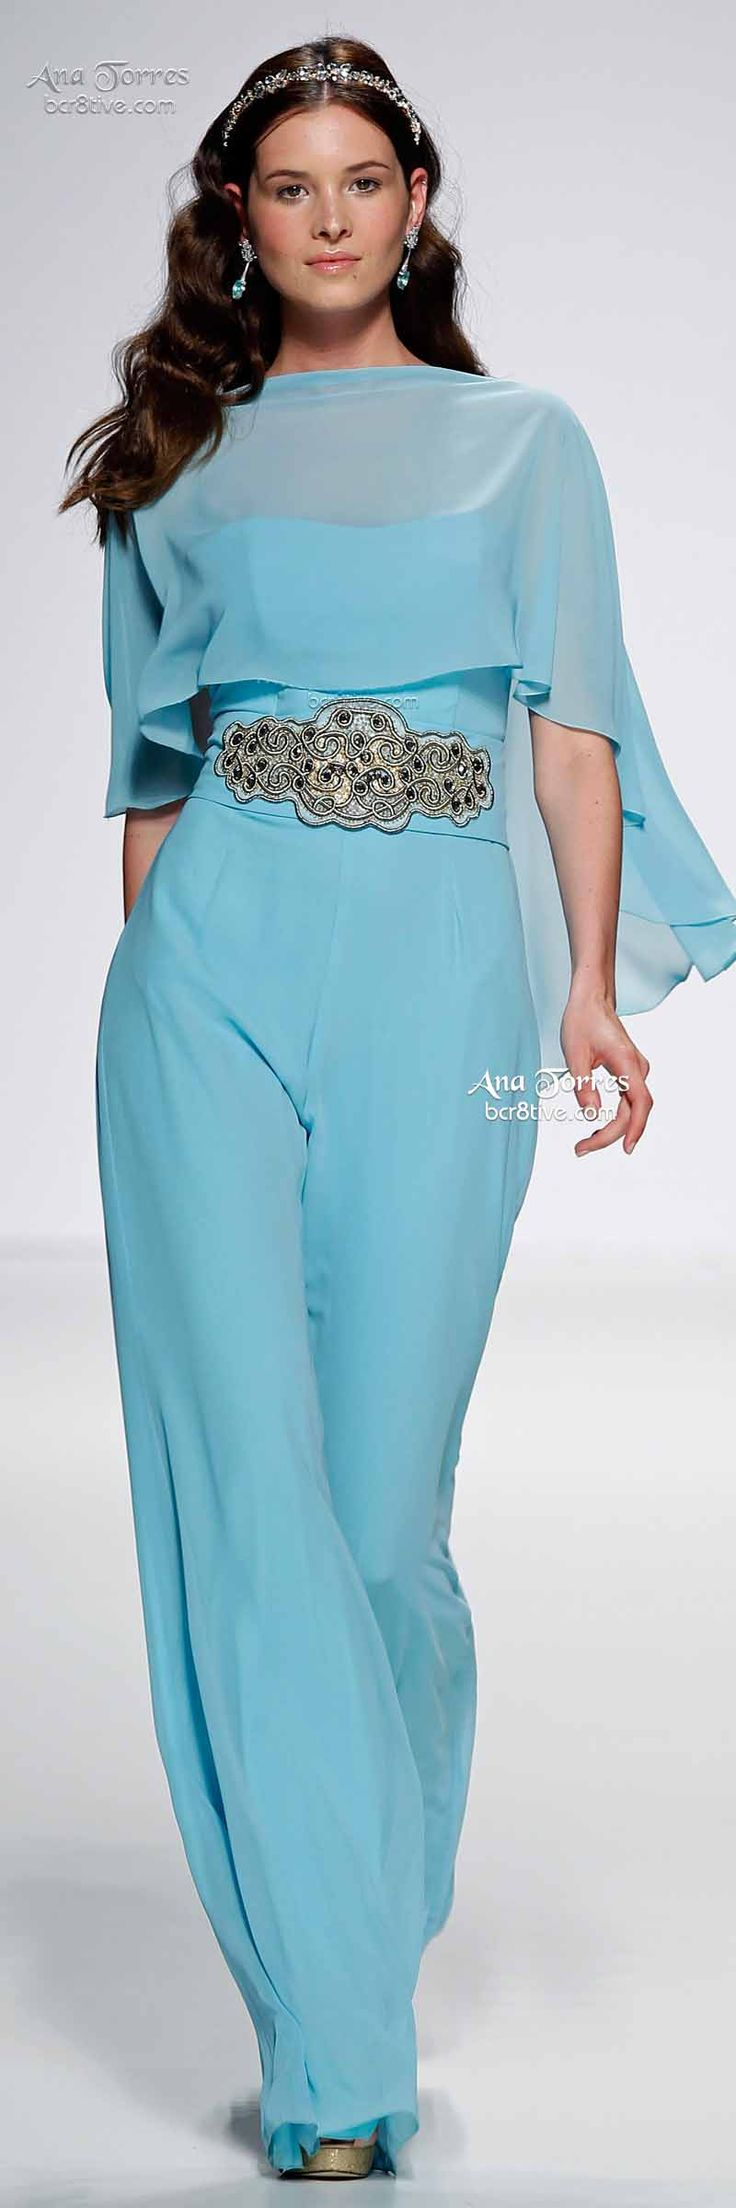 Ana Torres: Barcelona Bridal Week Spring 2015